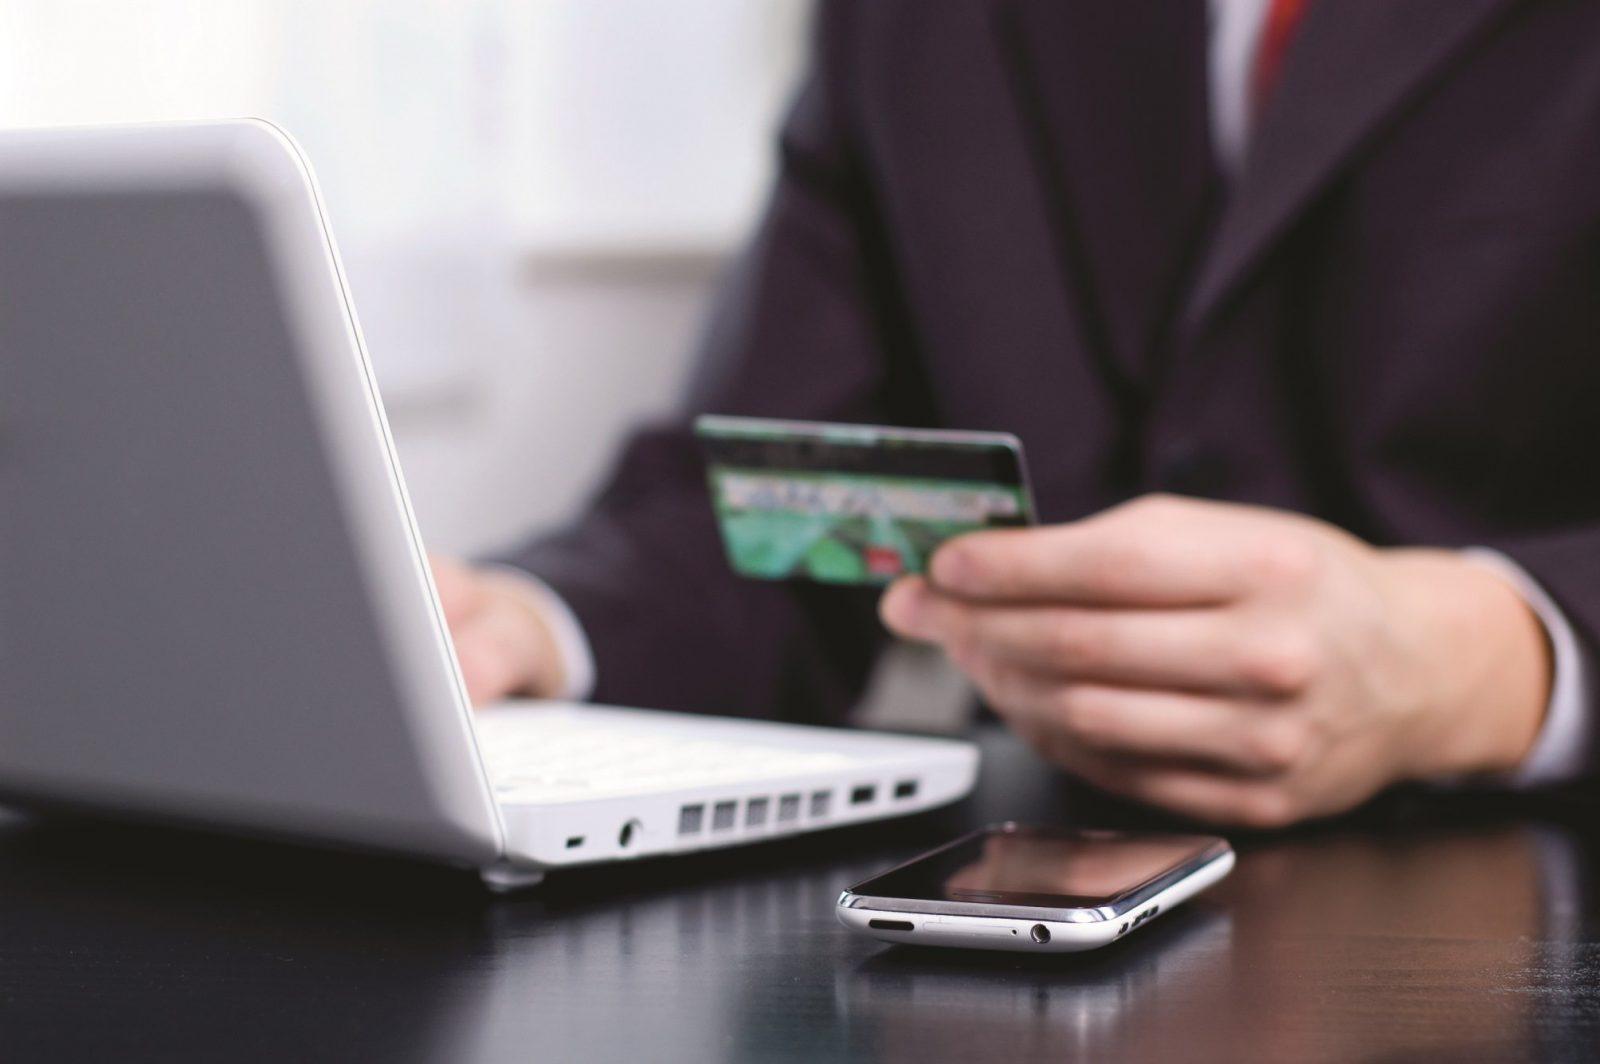 Мужчина за ноутбуком держит банковскую карту